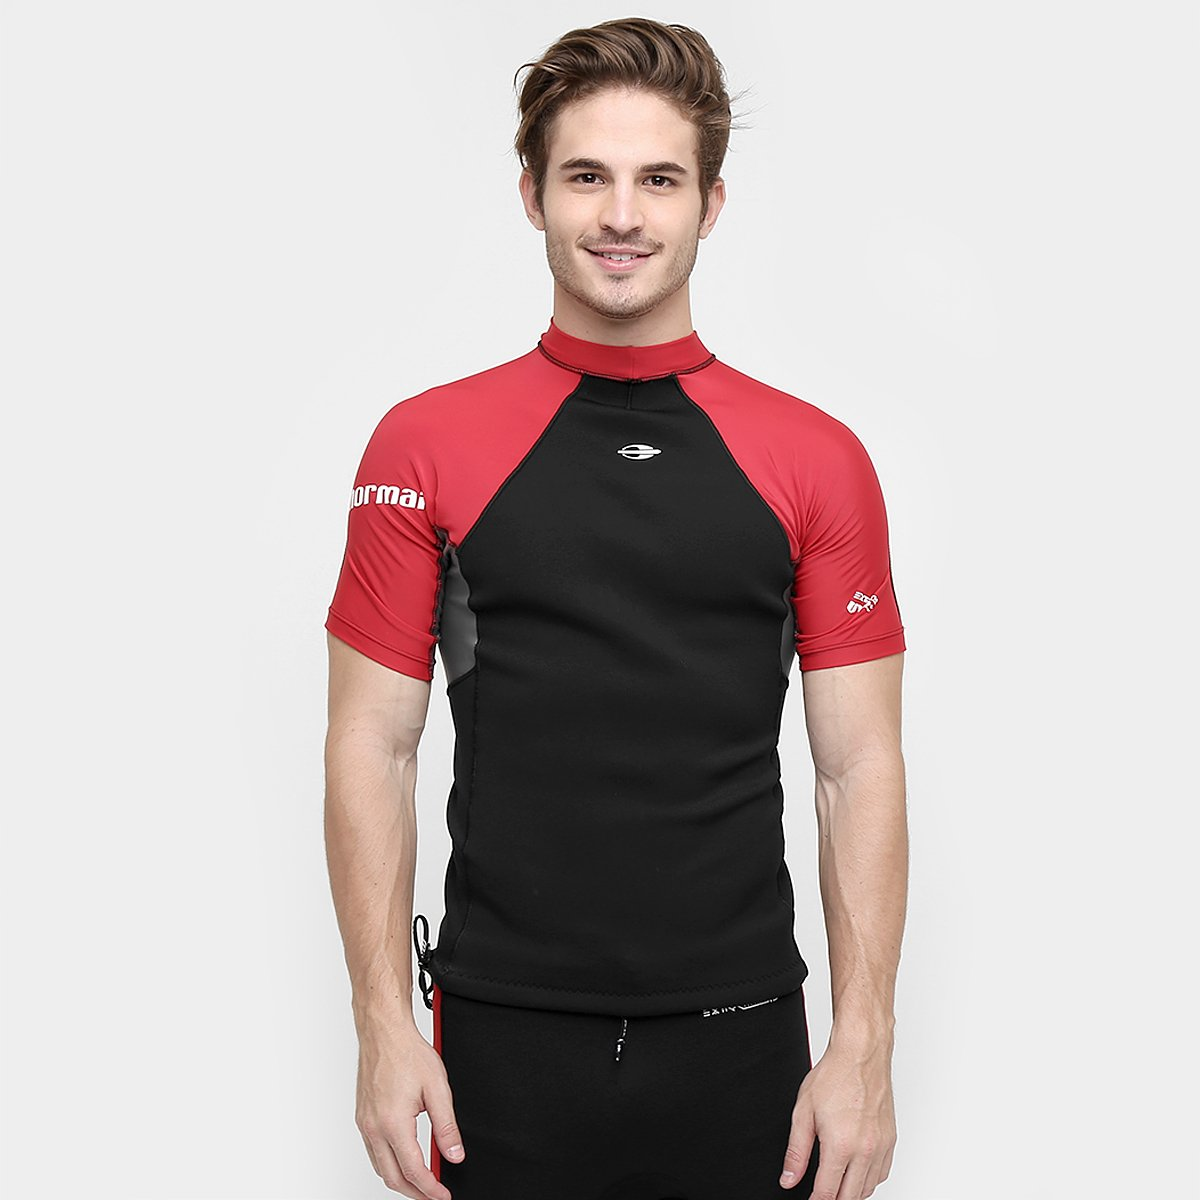 91c40a3244d5f Camisa Surf Mormaii Neoprene Extra Line 0.5 mm Masculina - Compre Agora